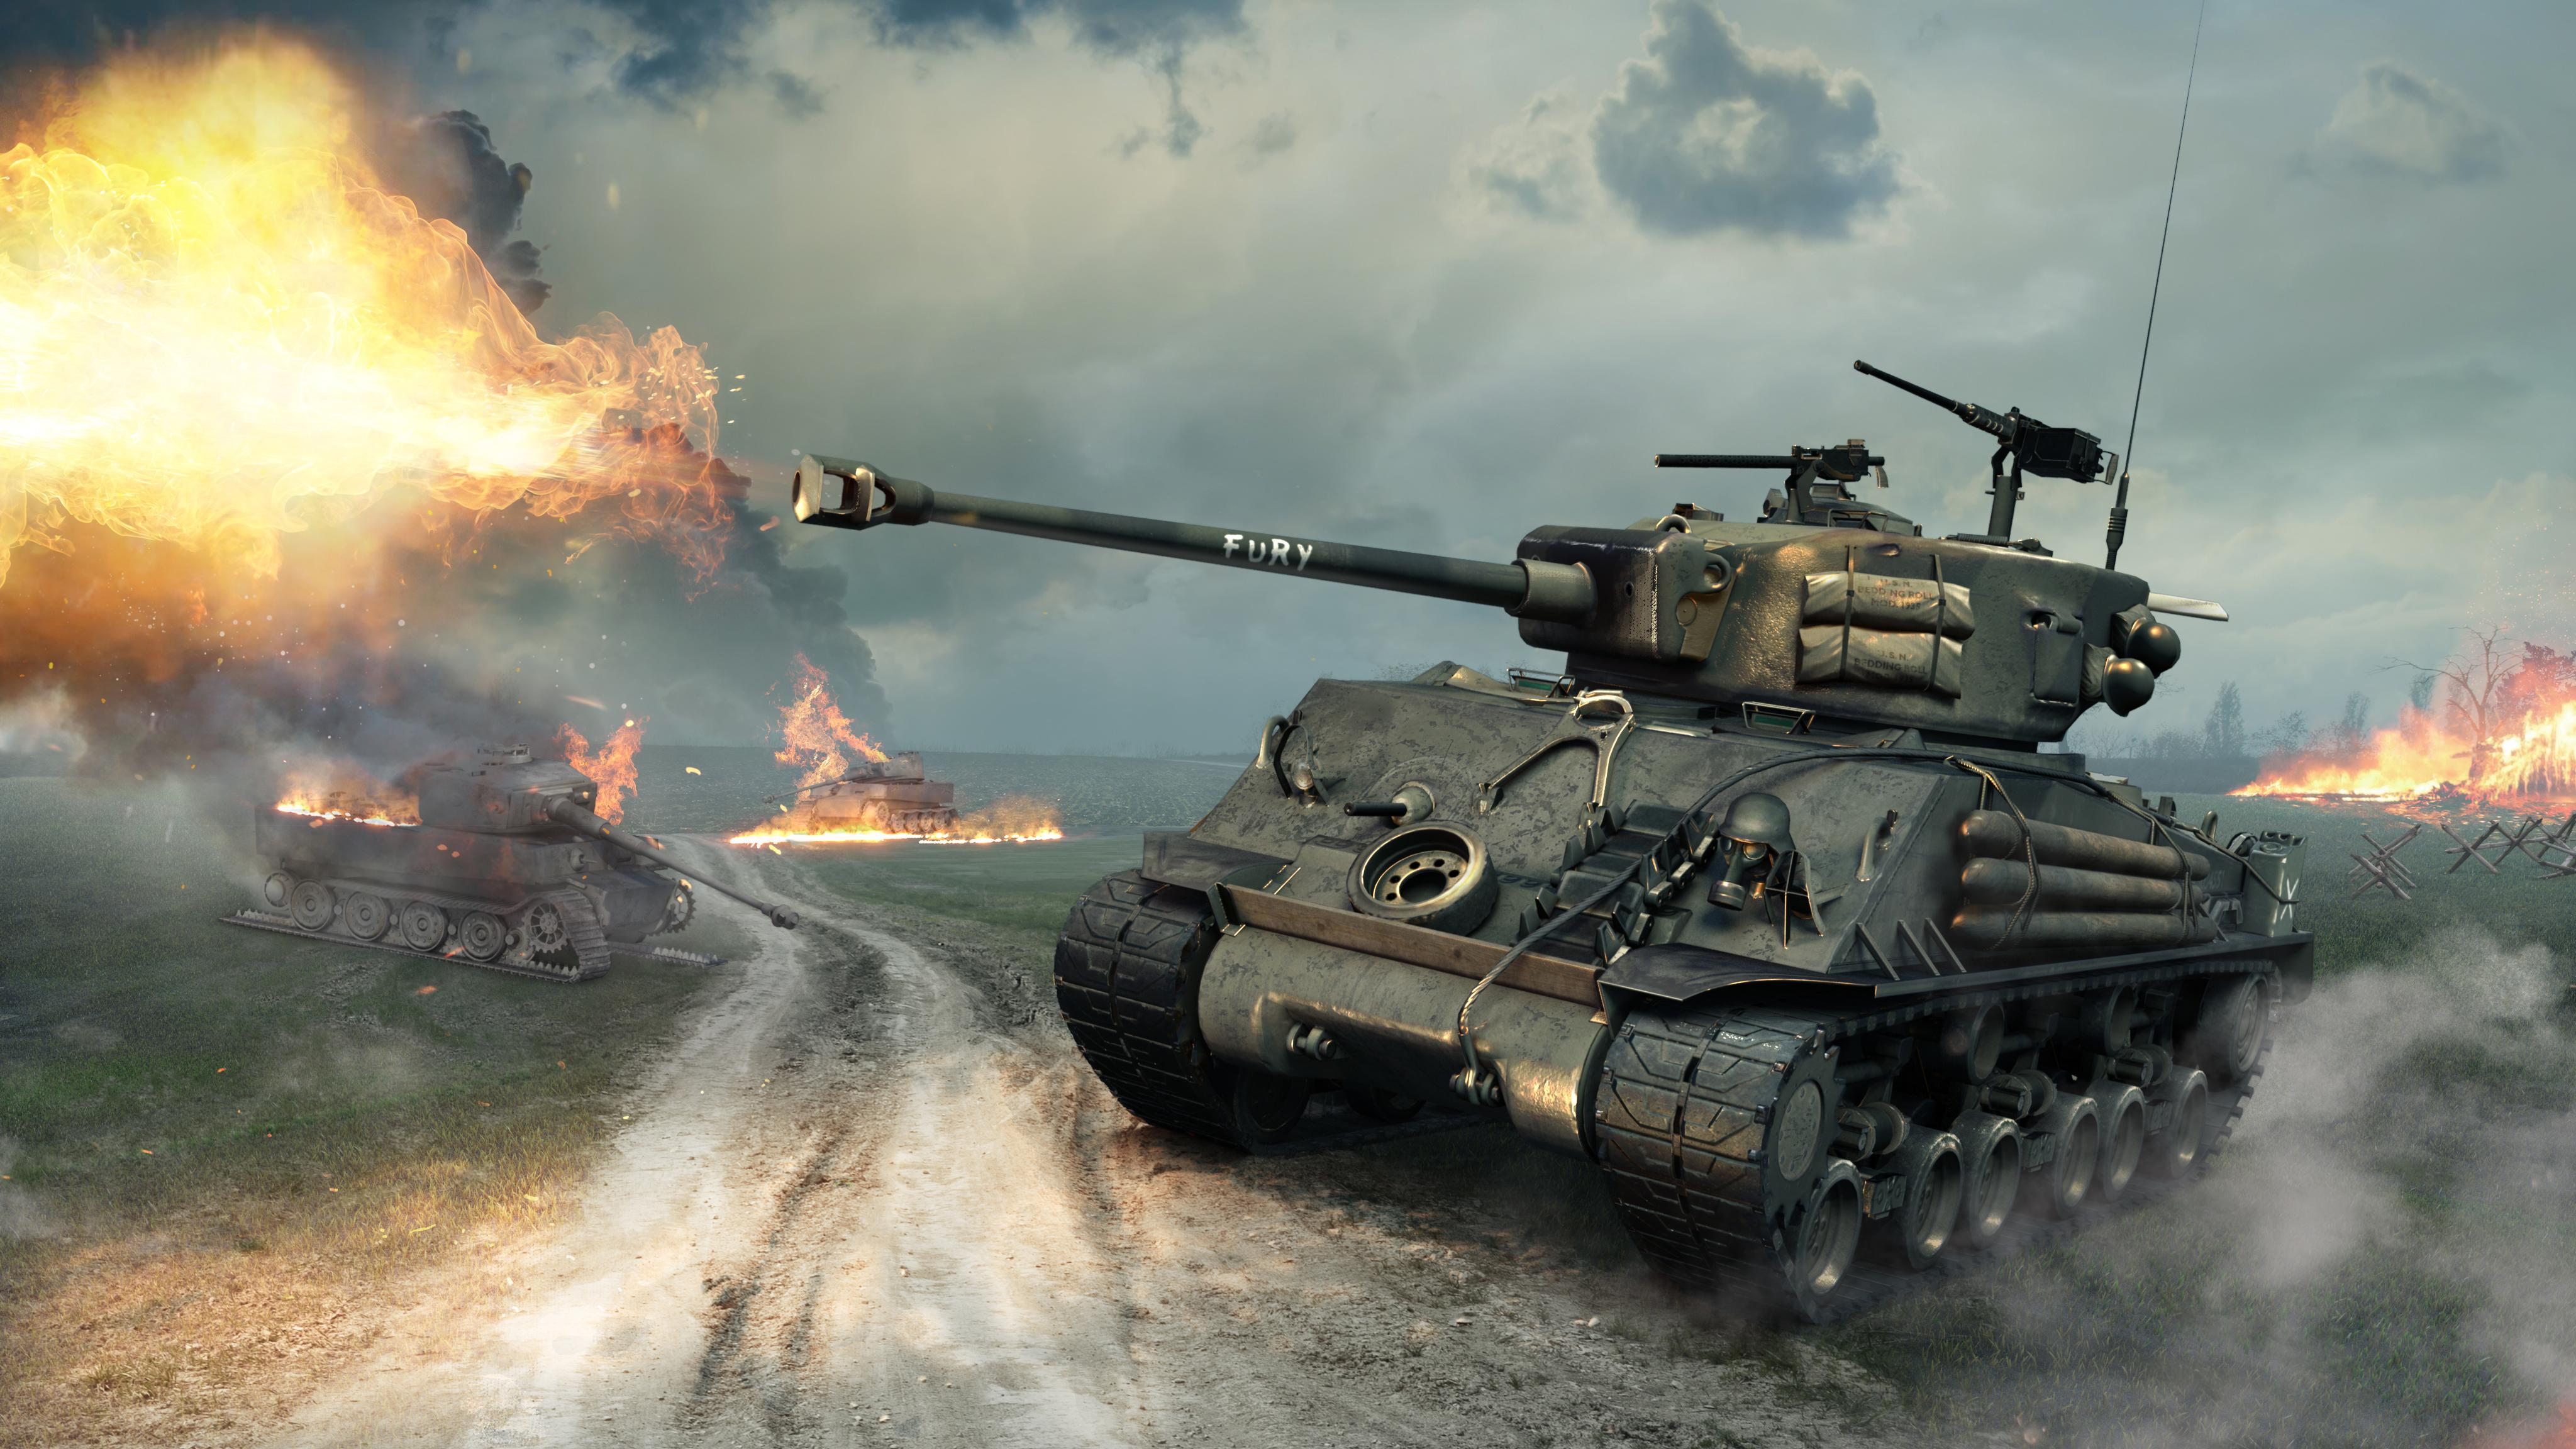 Fury M4 Sherman Tank in World of Tanks 4096x2304